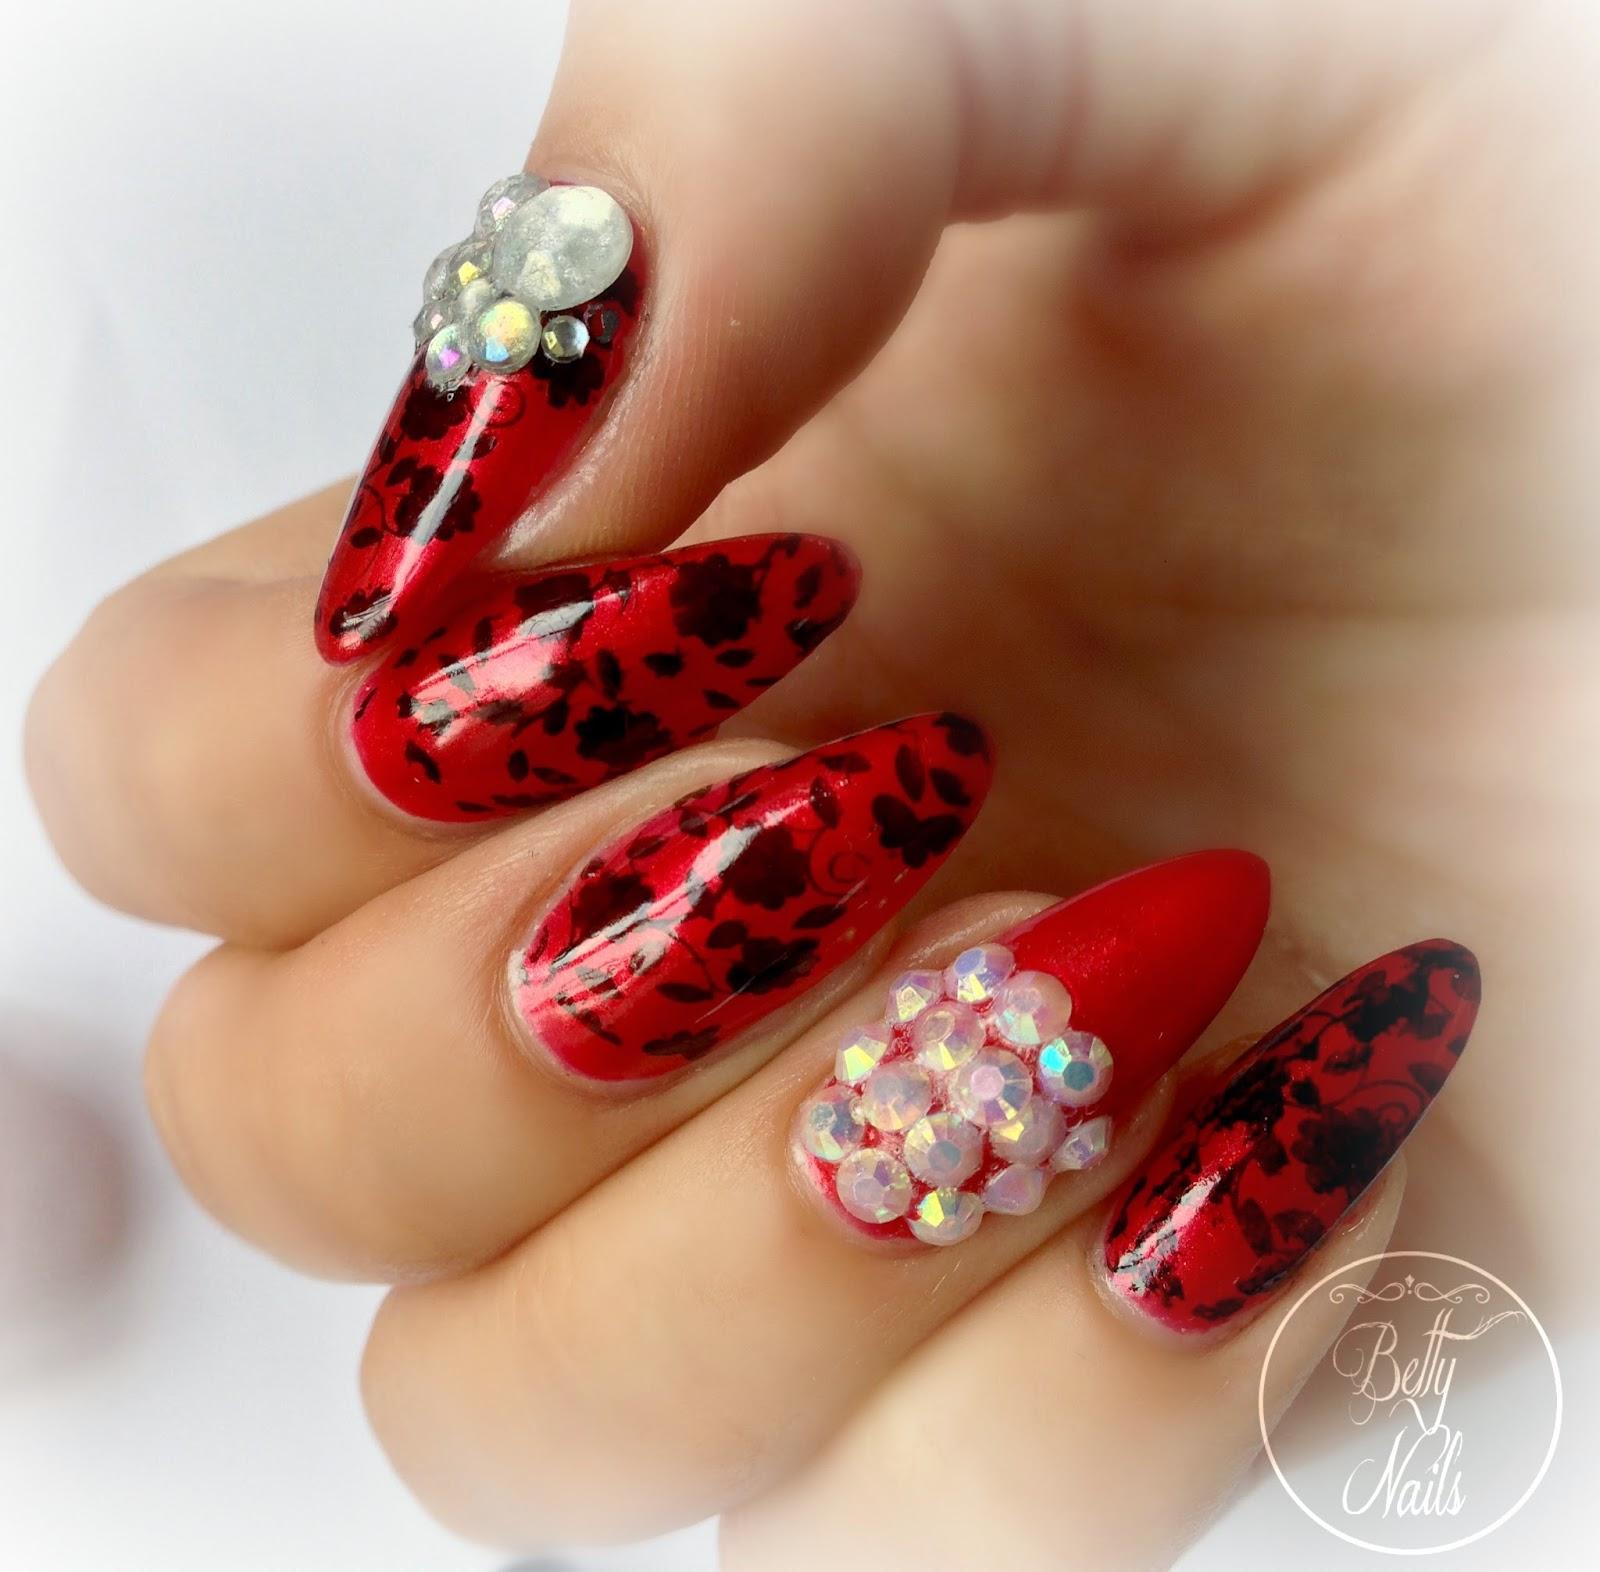 Kinetics - Iceland Poppy Bling Nailart   Betty Nails   Bloglovin\'